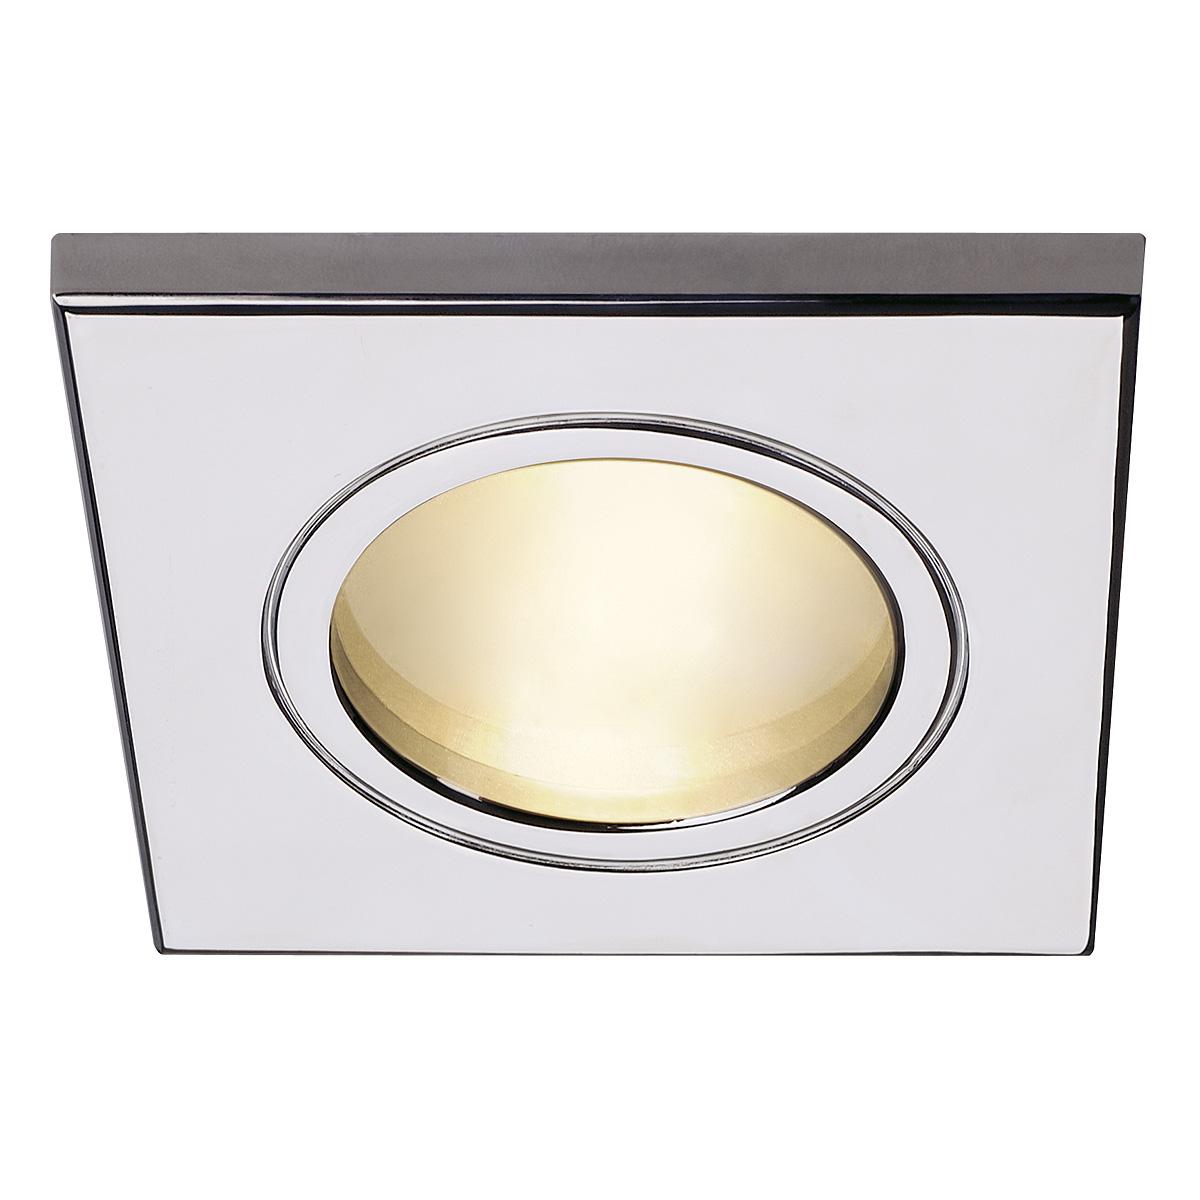 Dusche Led Lampe : im Bad oder der Dusche geeignet, IP44. Lieferung inkl. LED-Lampe